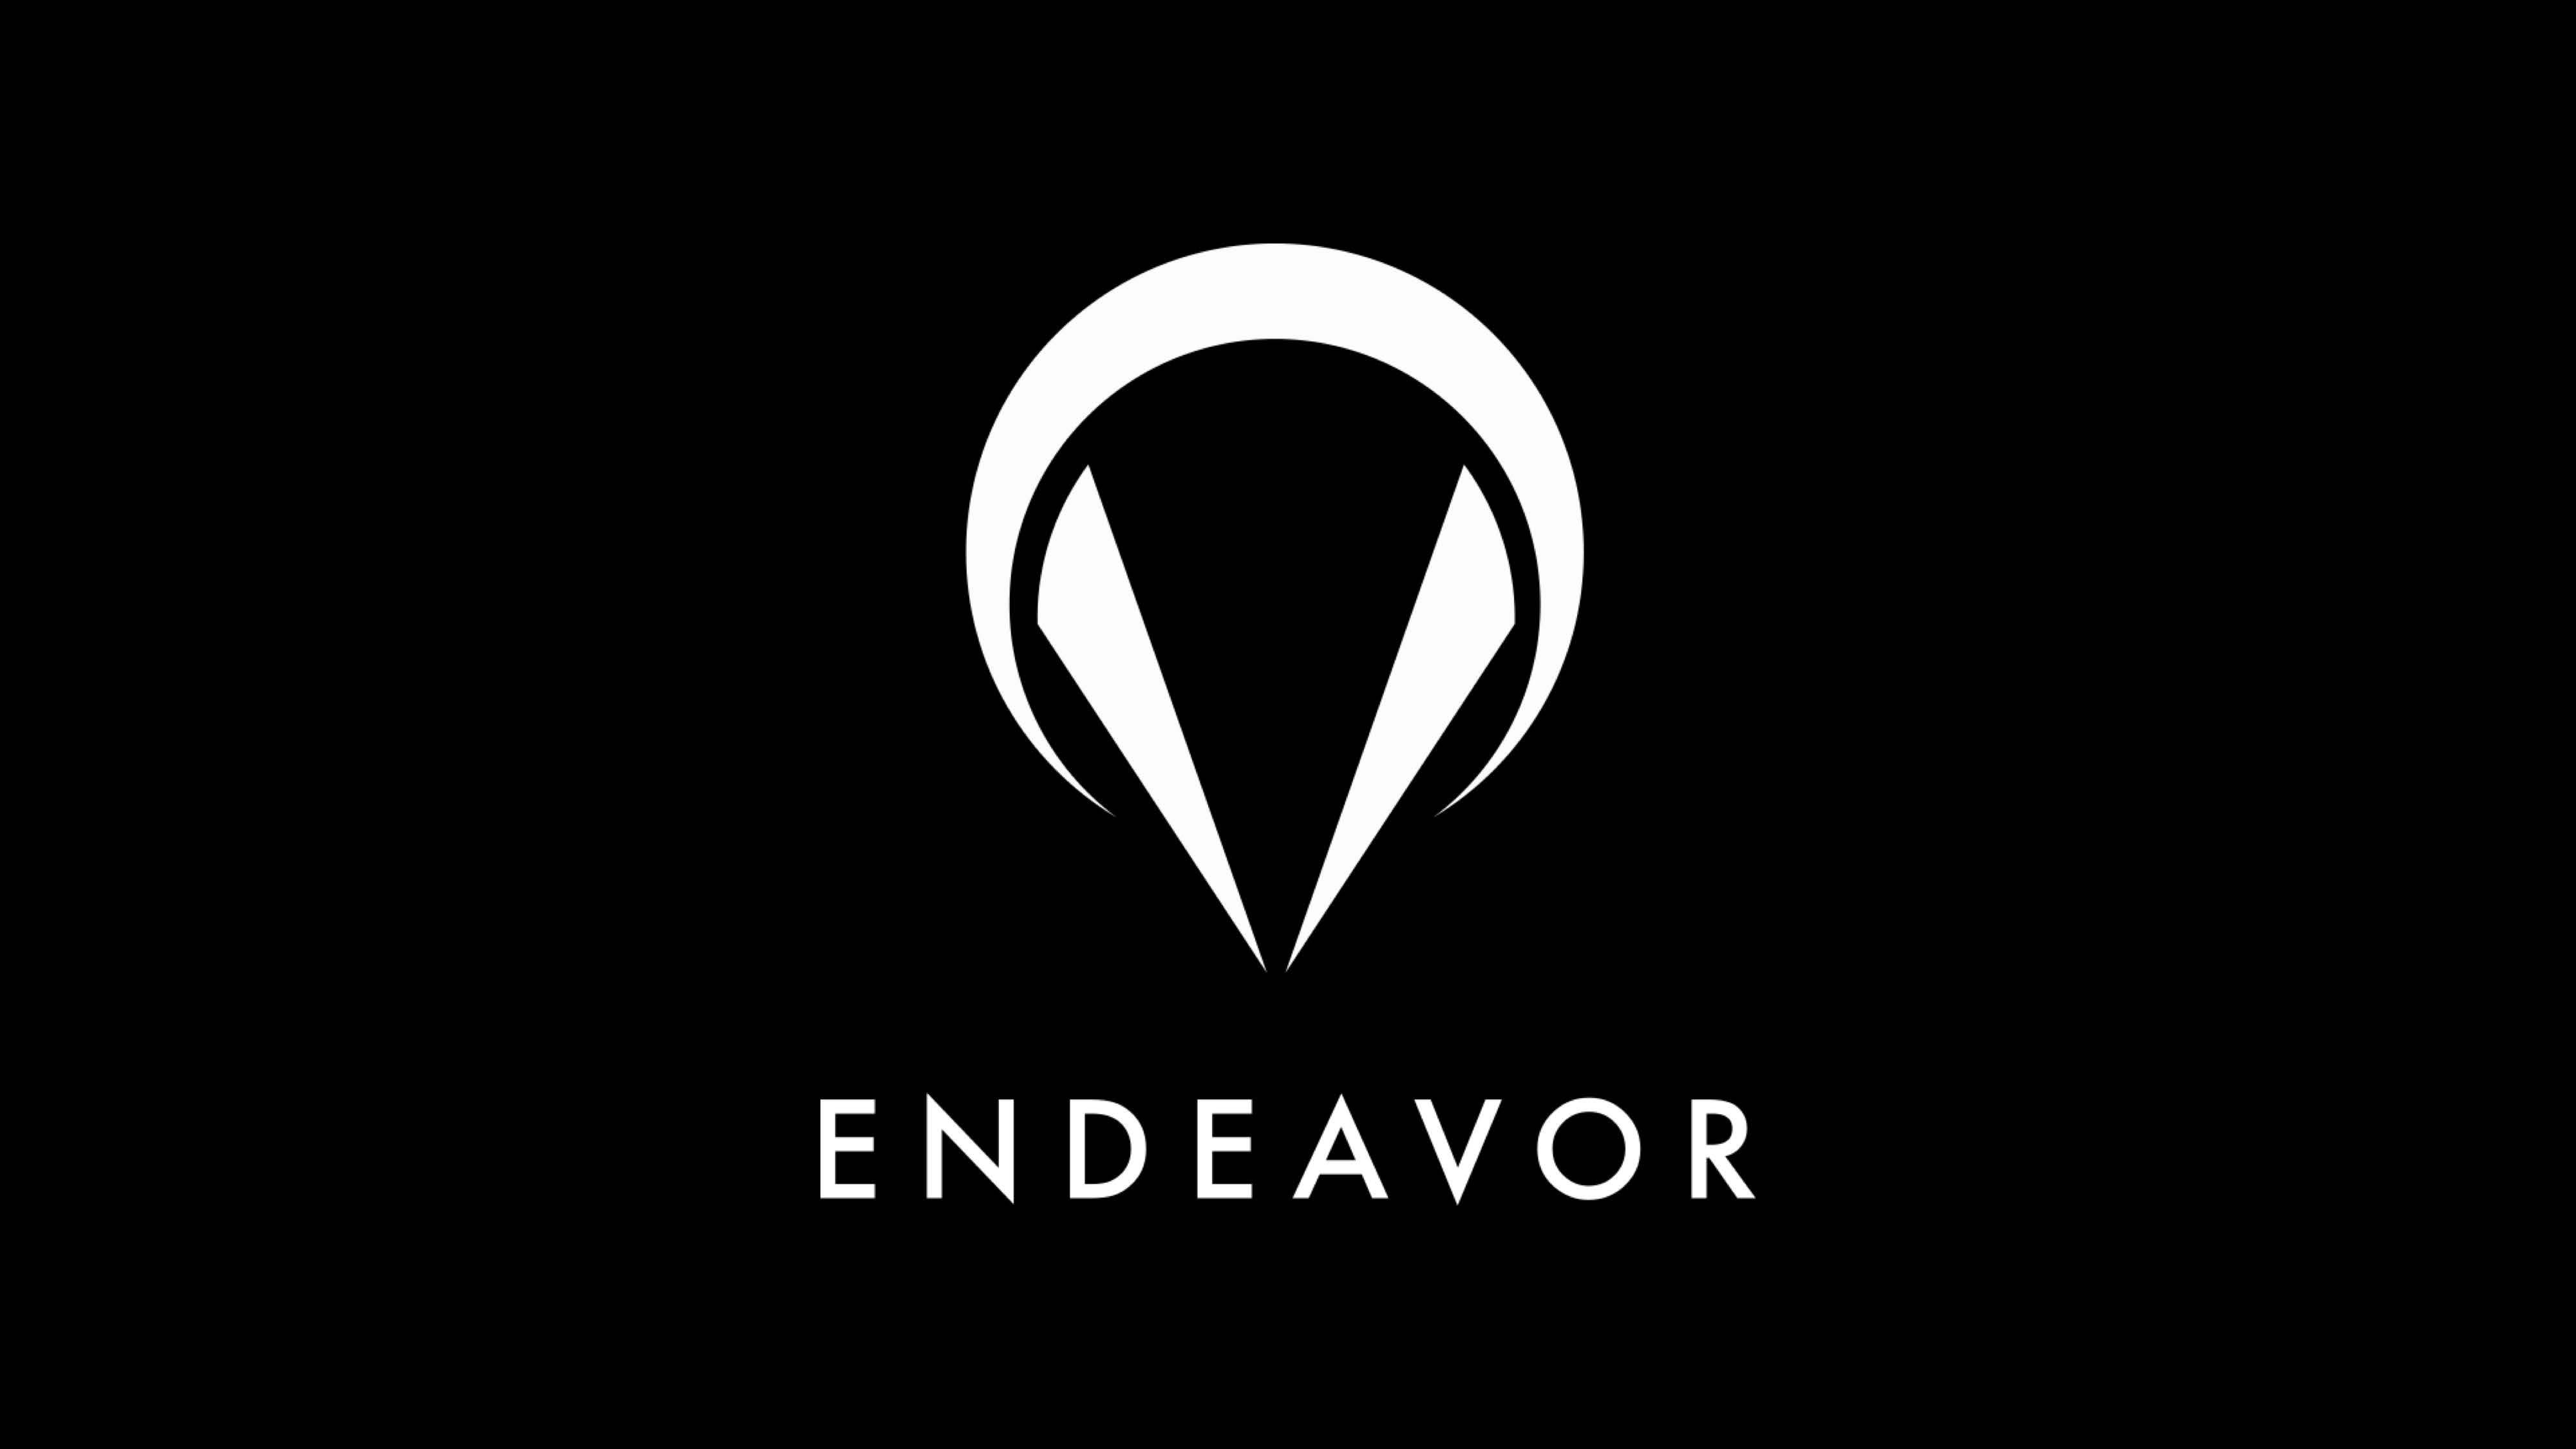 endeavor_13.jpg